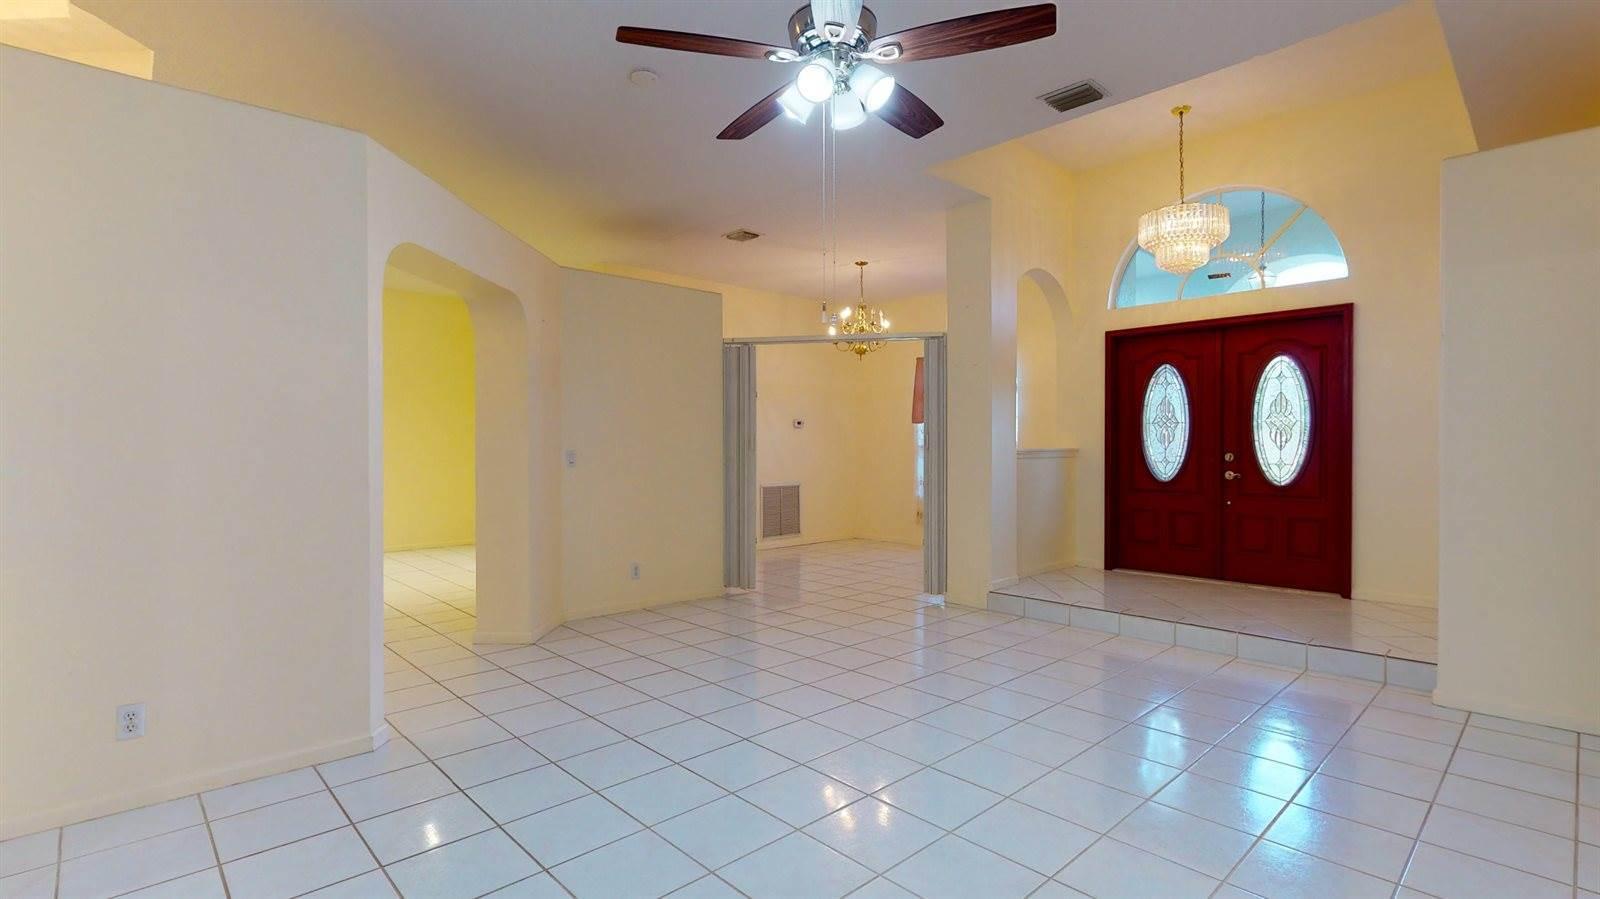 14860 North 89th Place, Loxahatchee, FL 33470